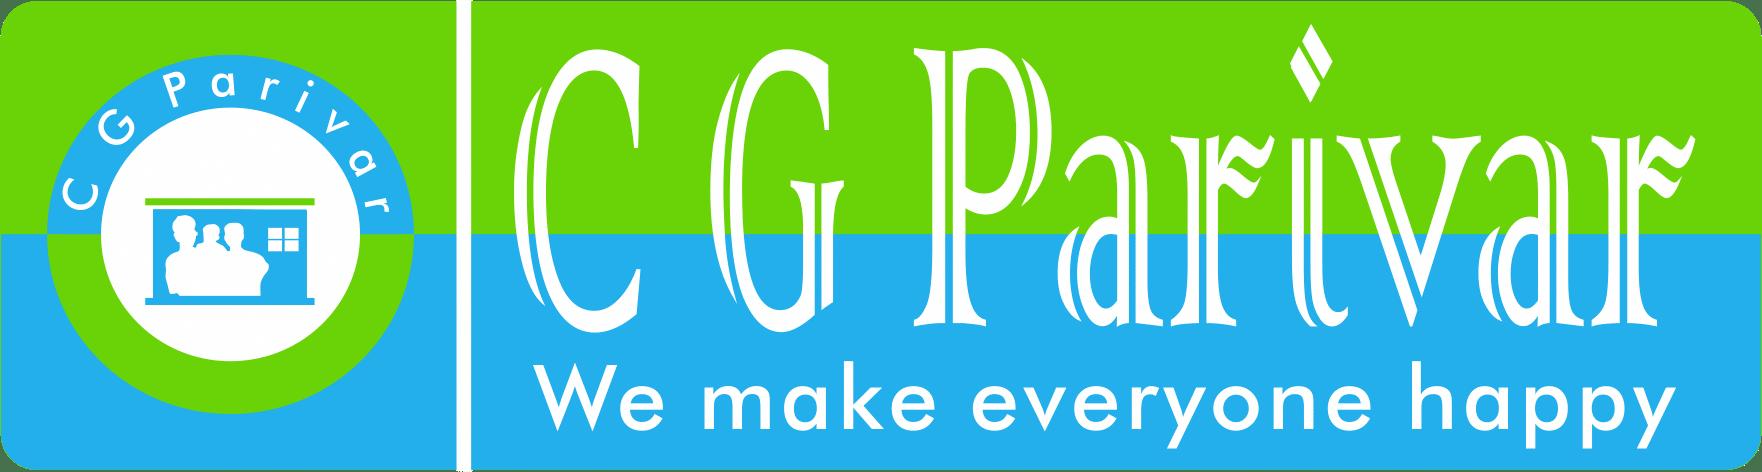 https://digi1.co/wp-content/uploads/2018/08/cgparivar-logo.png